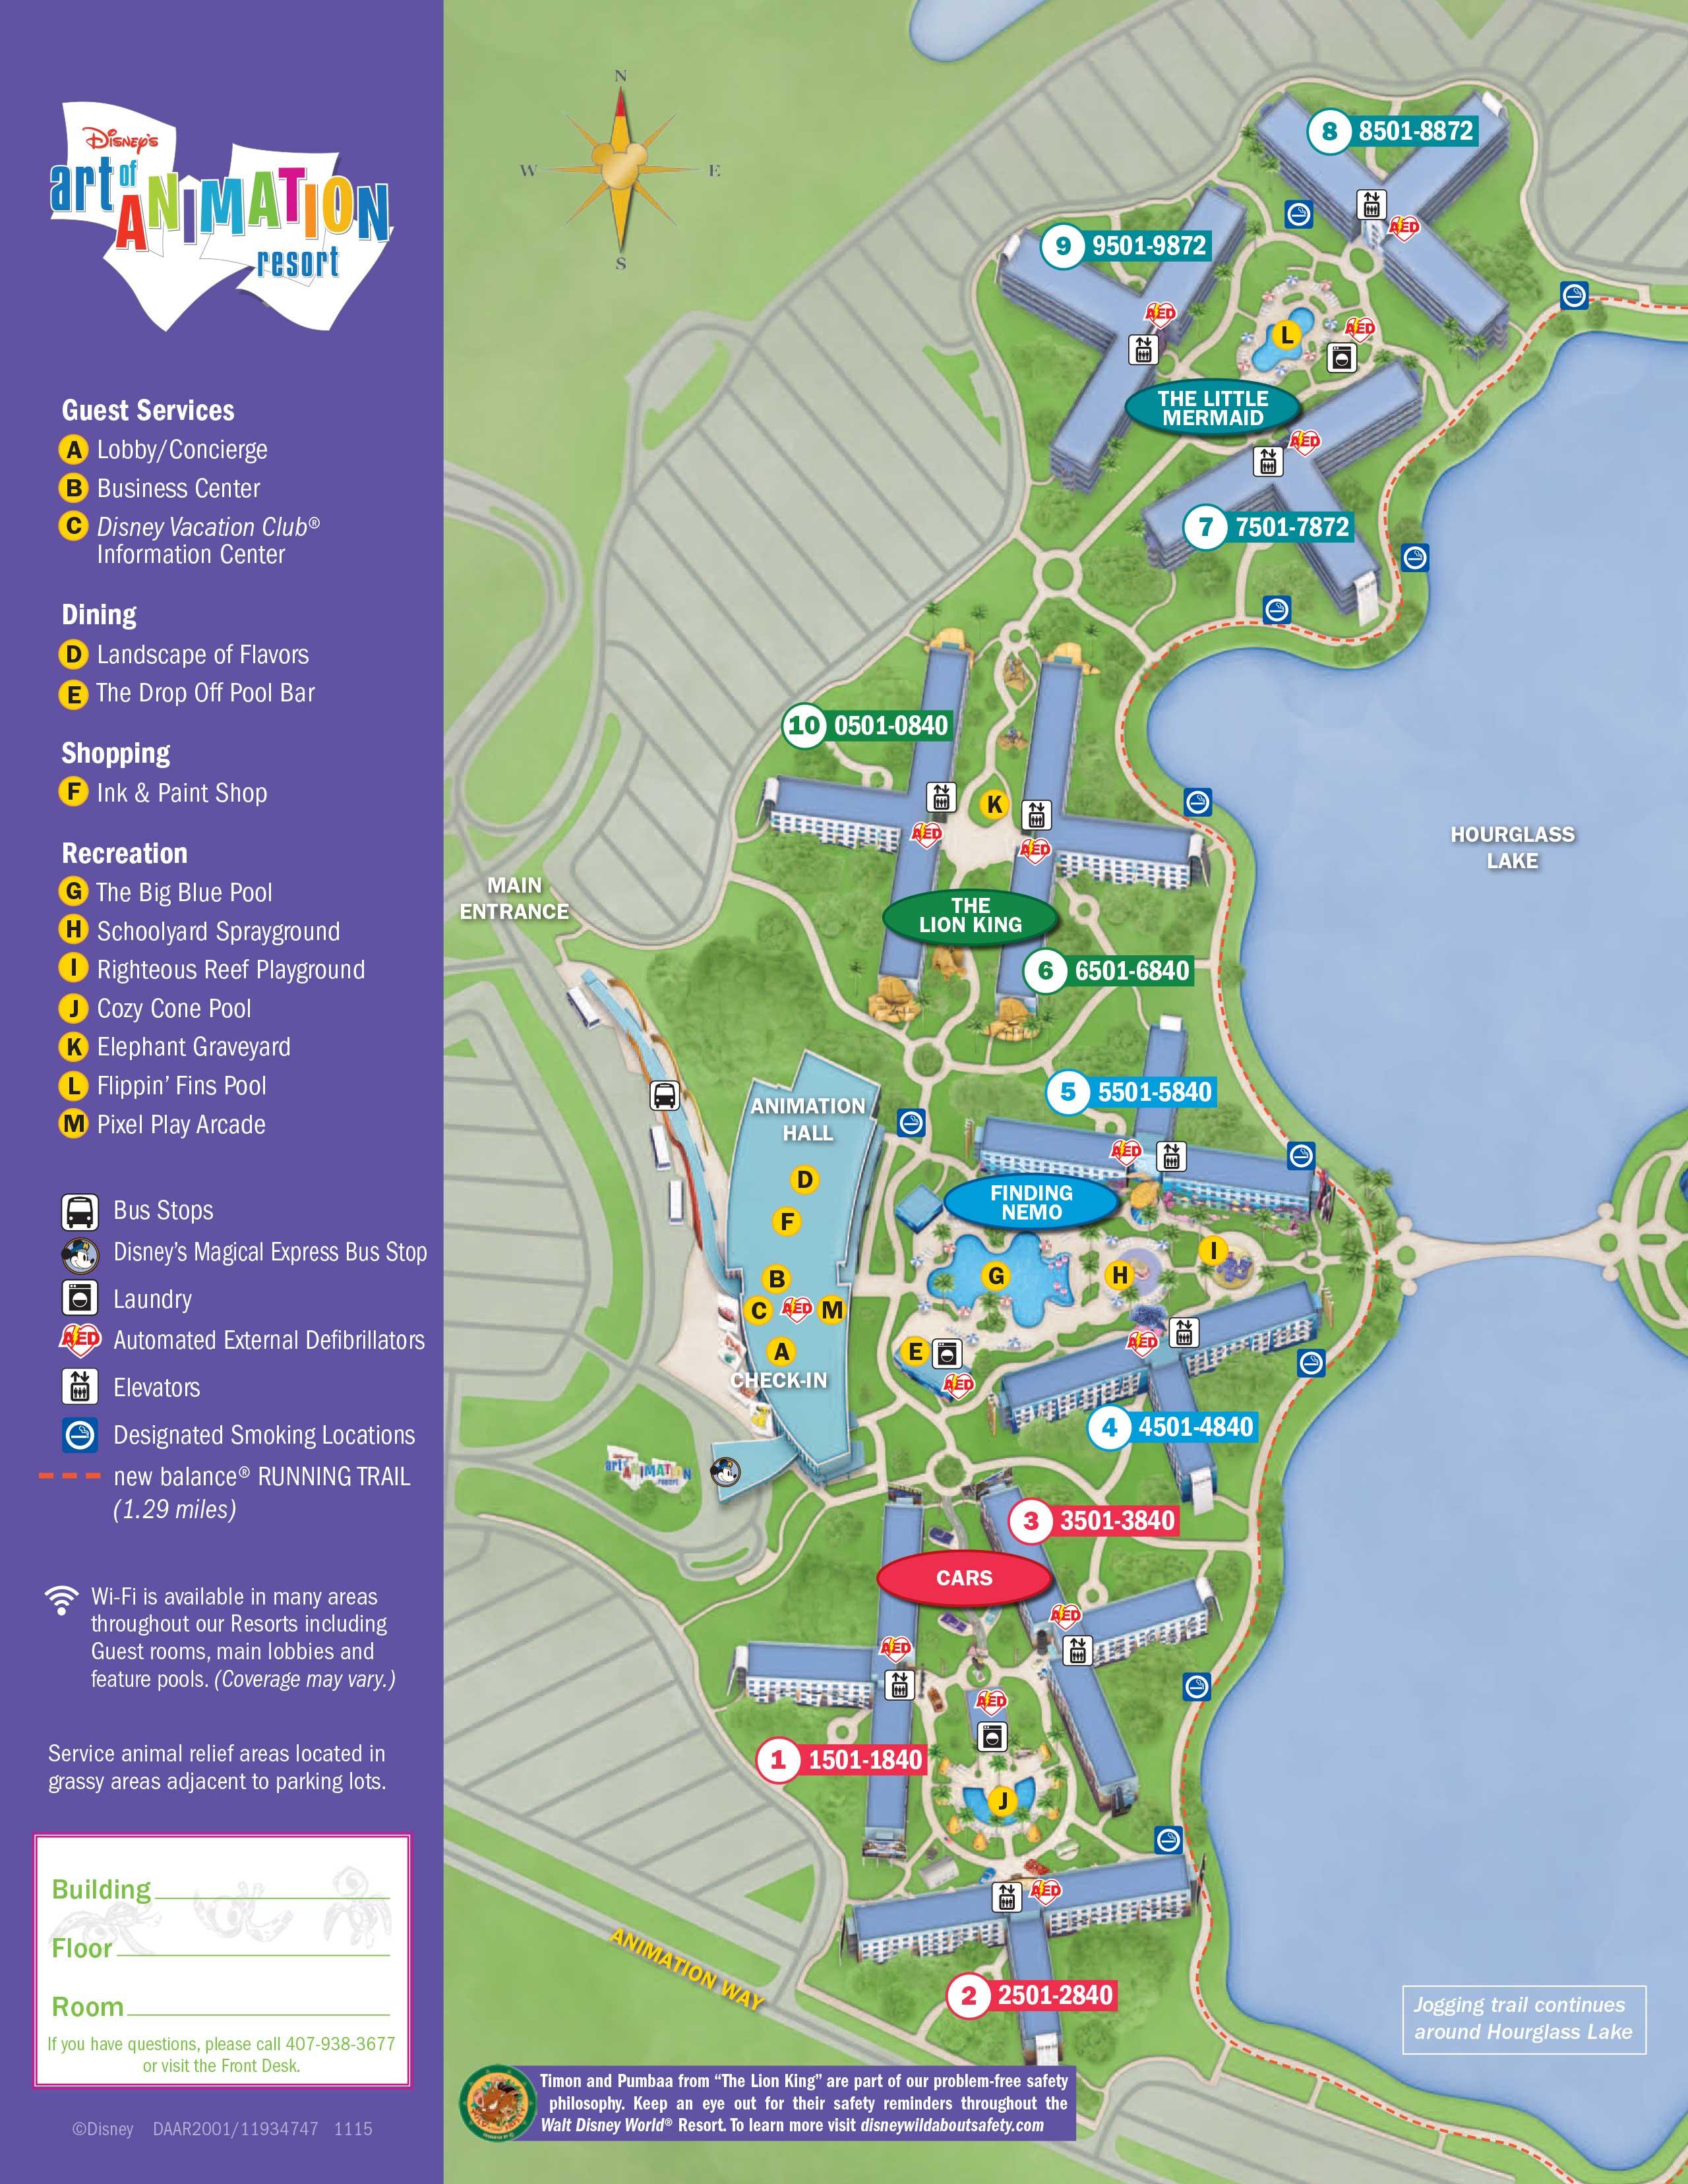 Walt Disney World Map With Hotels.April 2017 Walt Disney World Resort Hotel Maps Photo 5 Of 33